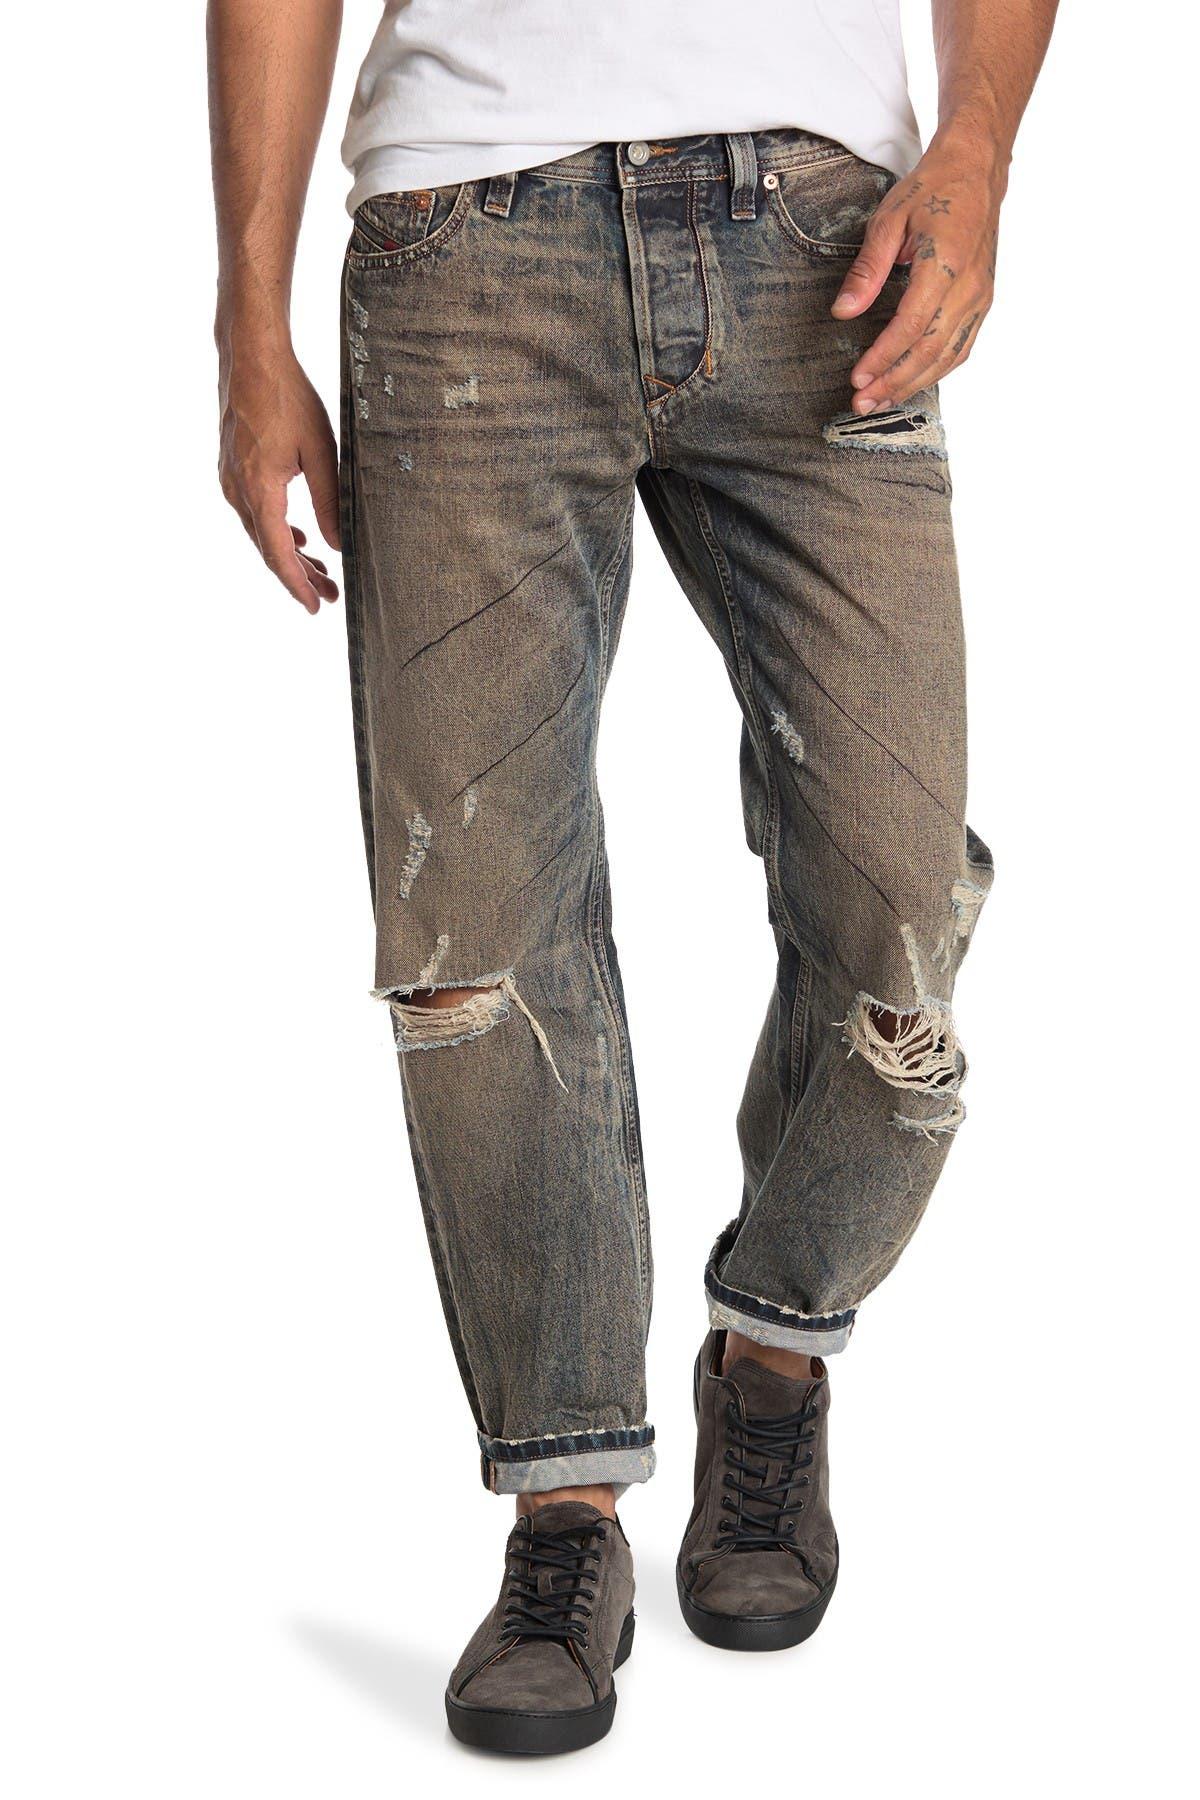 Image of Diesel Larkee Slim Straight Distressed Jeans